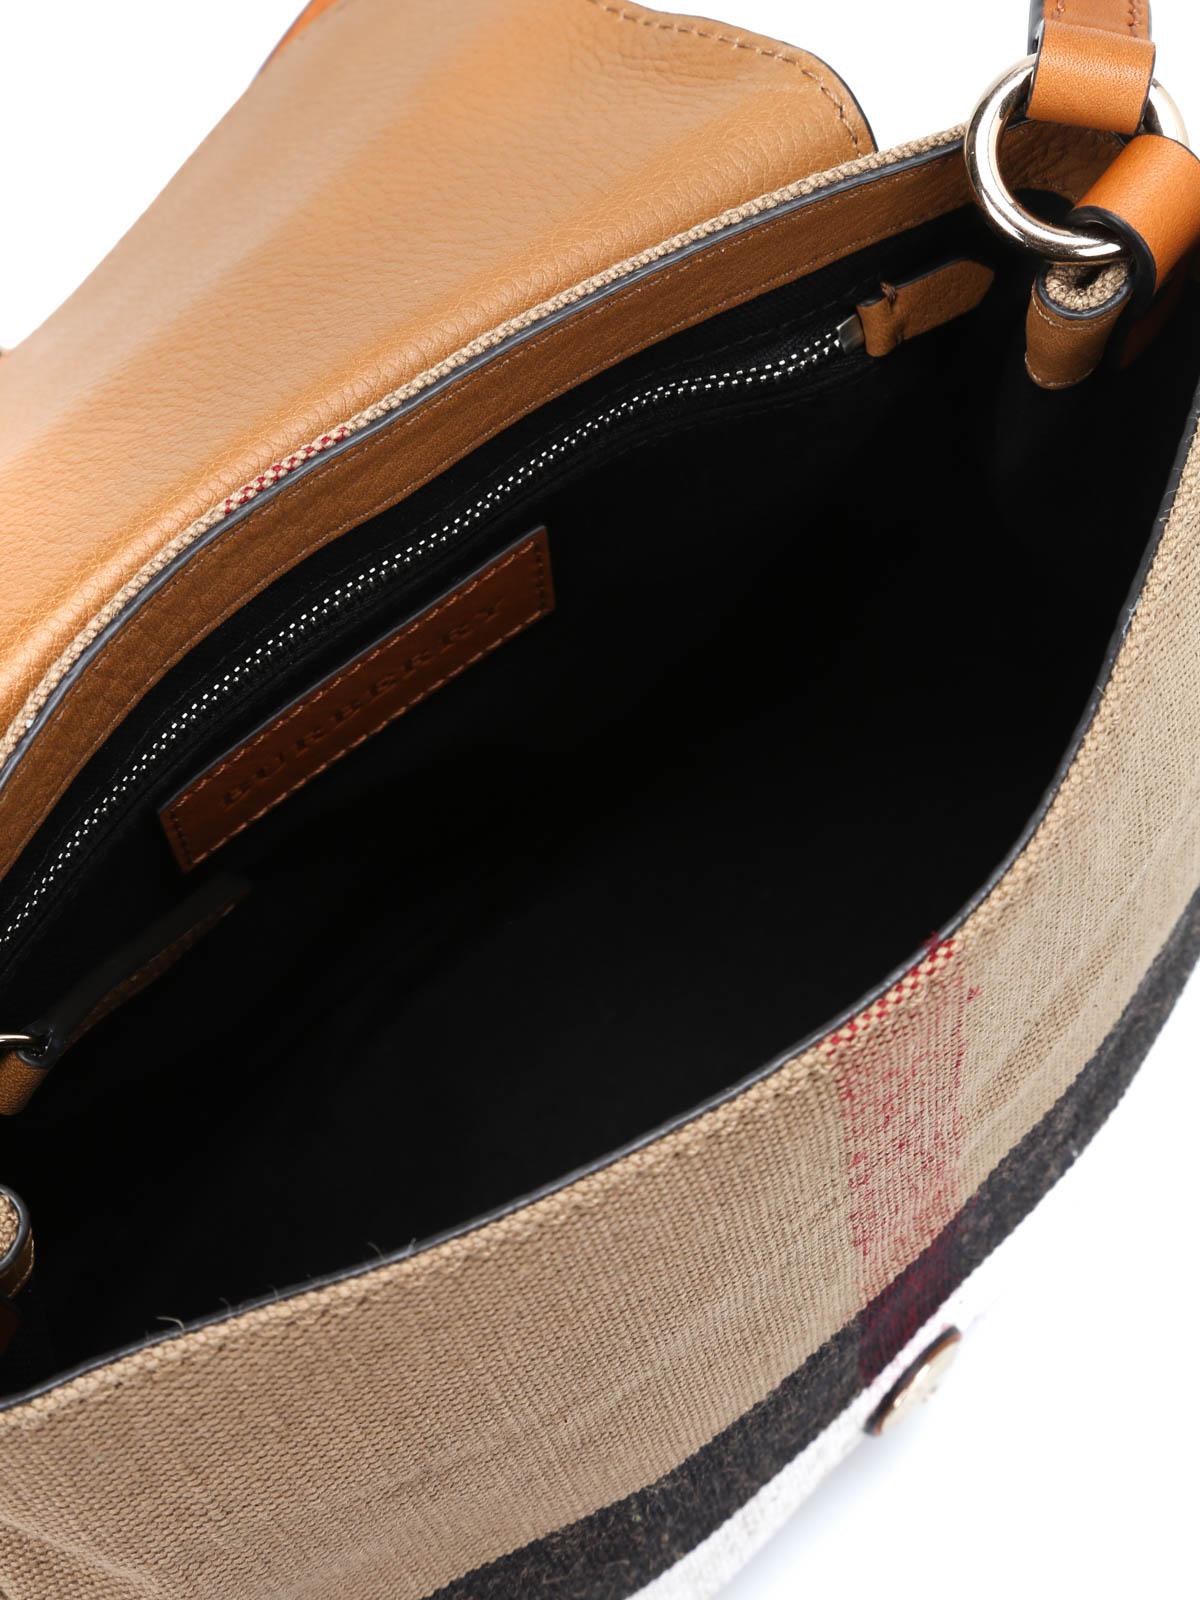 dd674c98f16f iKRIX BURBERRY  Small Gowan canvas bag. BURBERRY  cross body bags ...